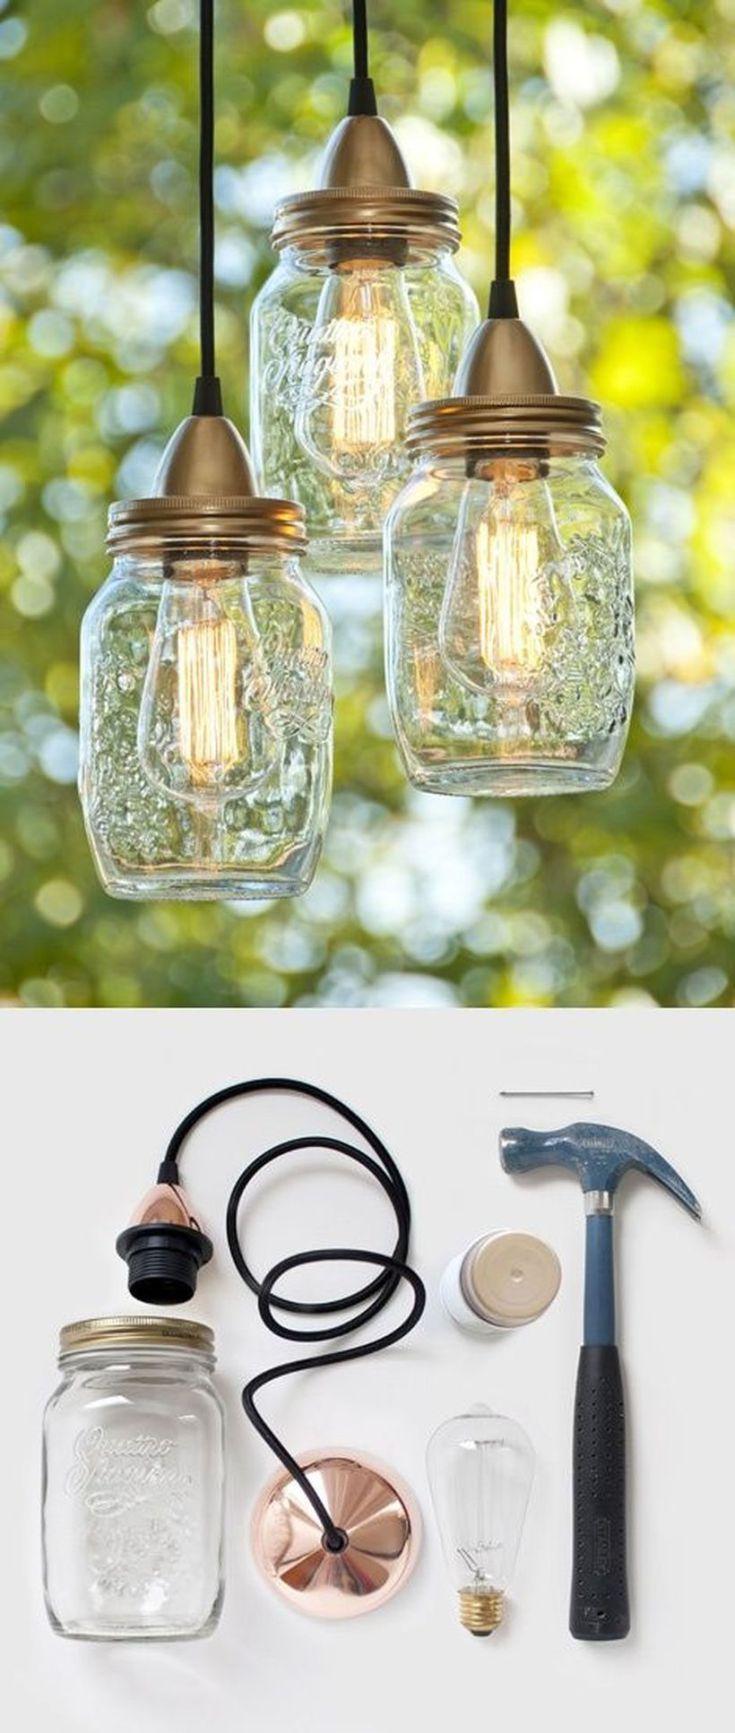 Amazing Rustic Hanging Bulb Lighting Ideas 18